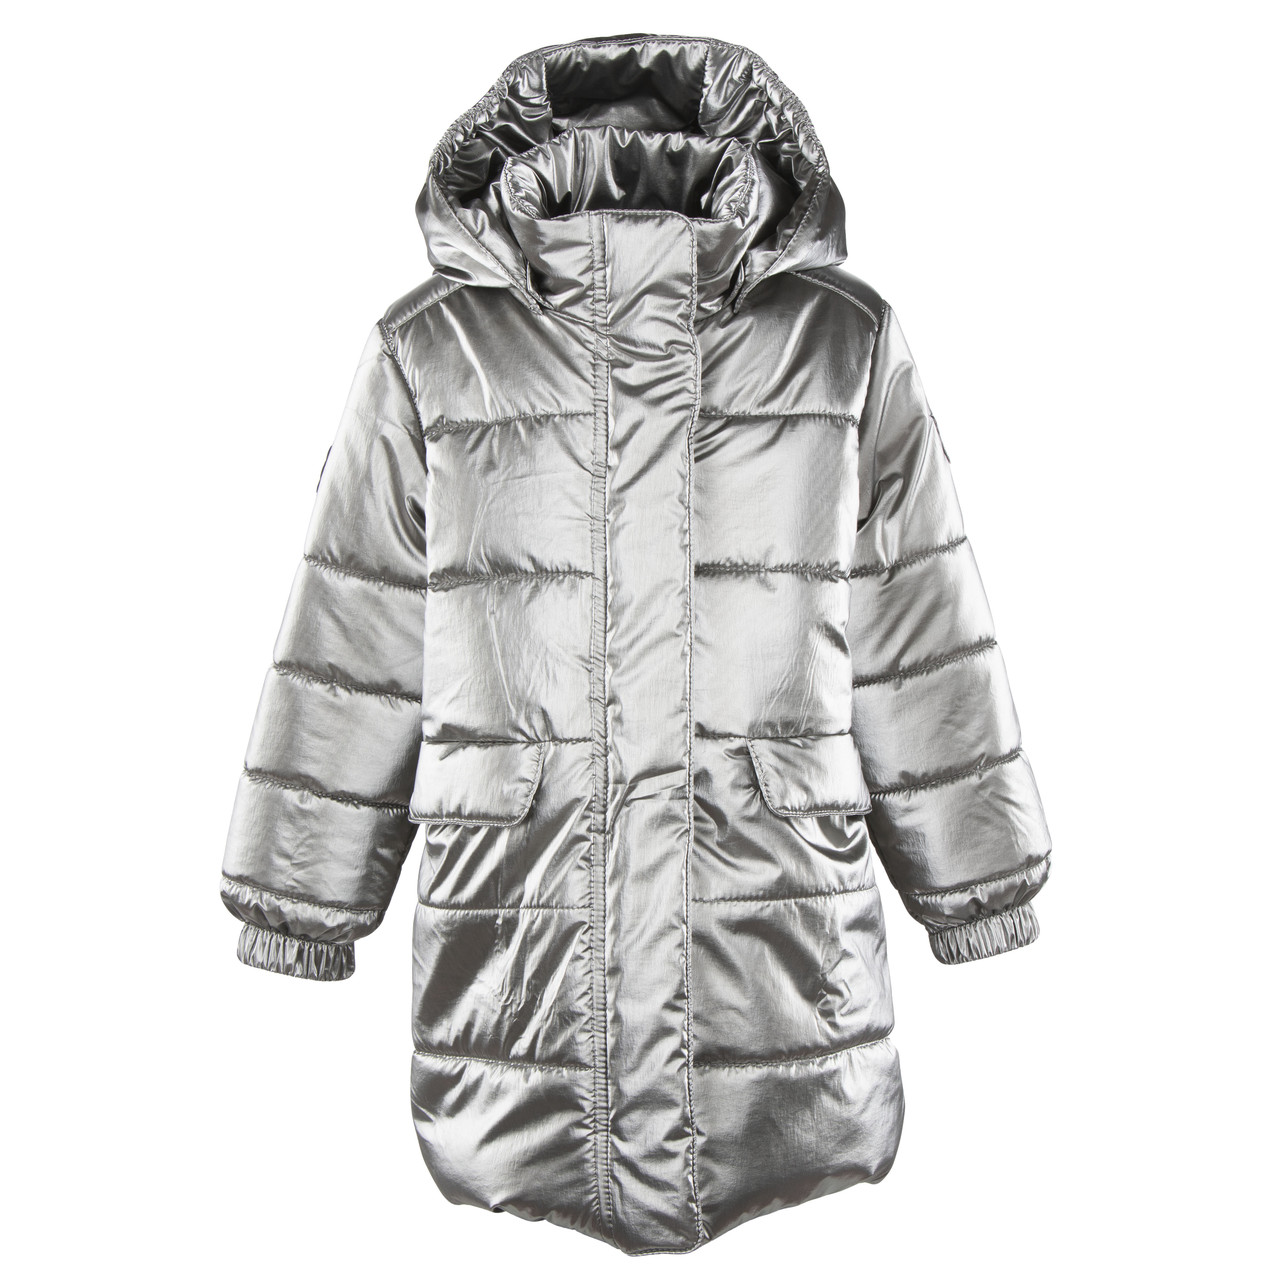 Пальто для девочек Kerry AVALON